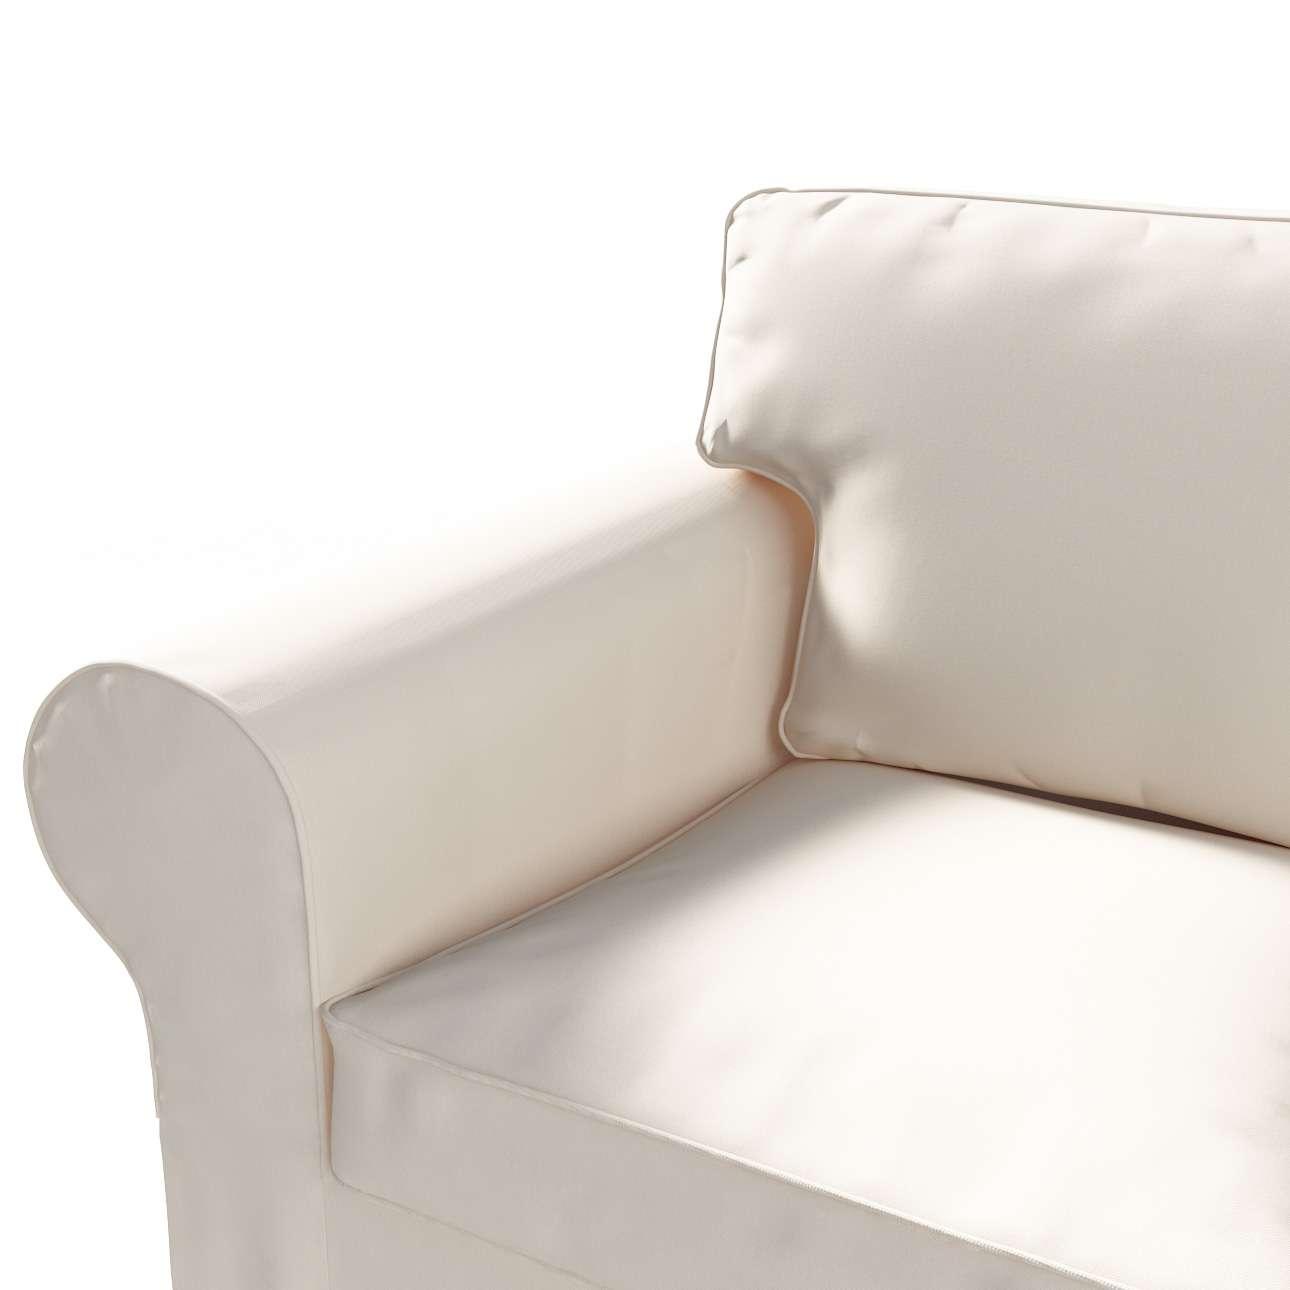 Ektorp 3-Sitzer Schlafsofabezug, ALTES Modell Sofahusse Ektorp 3-Sitzer Schlafsofa von der Kollektion Etna, Stoff: 705-01